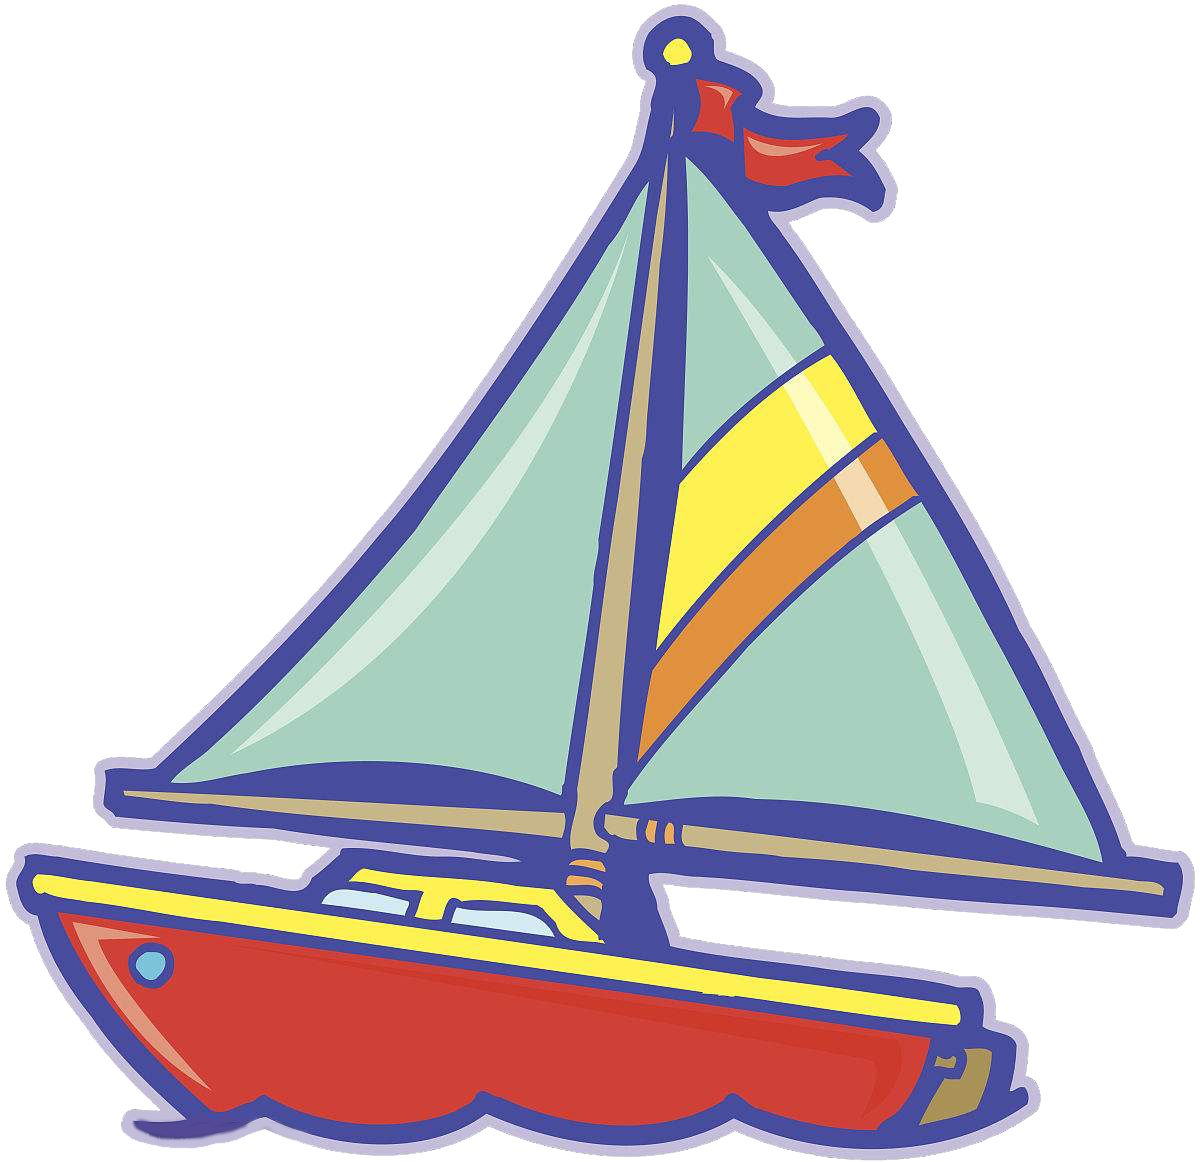 png royalty free stock Yacht clipart triangle. Sailboat sailing ship cartoon